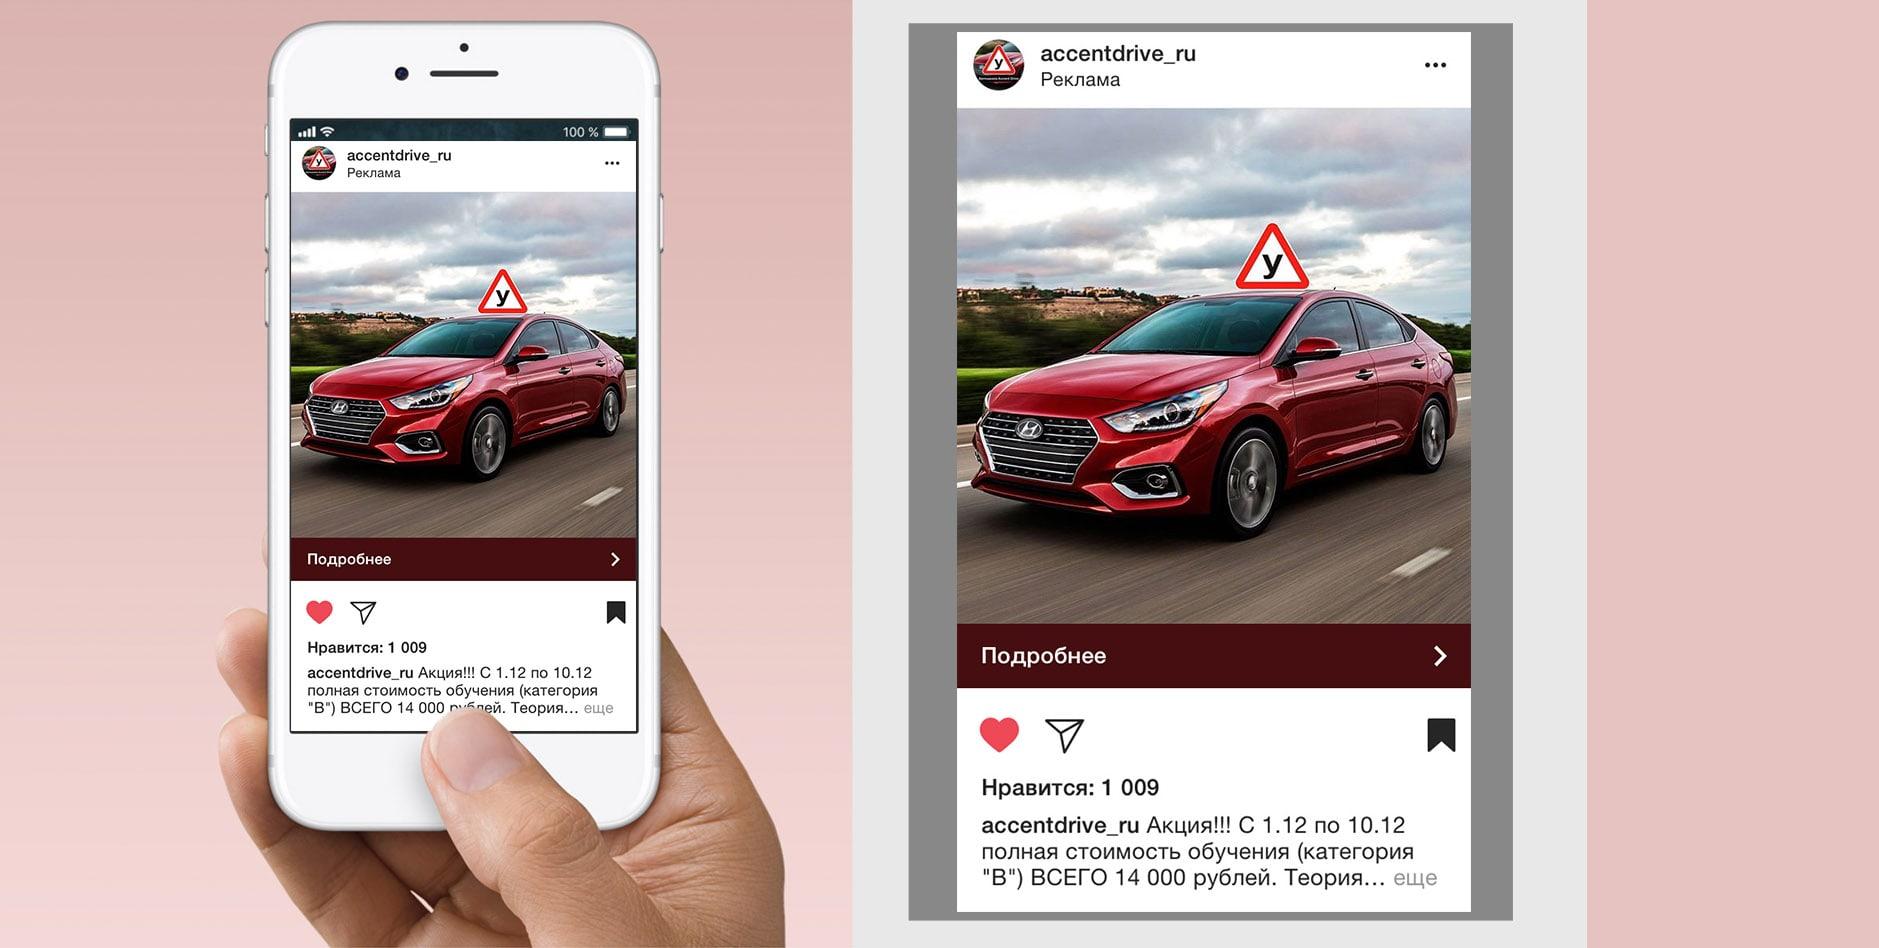 Рекламная кампания Accent Drive Instagram